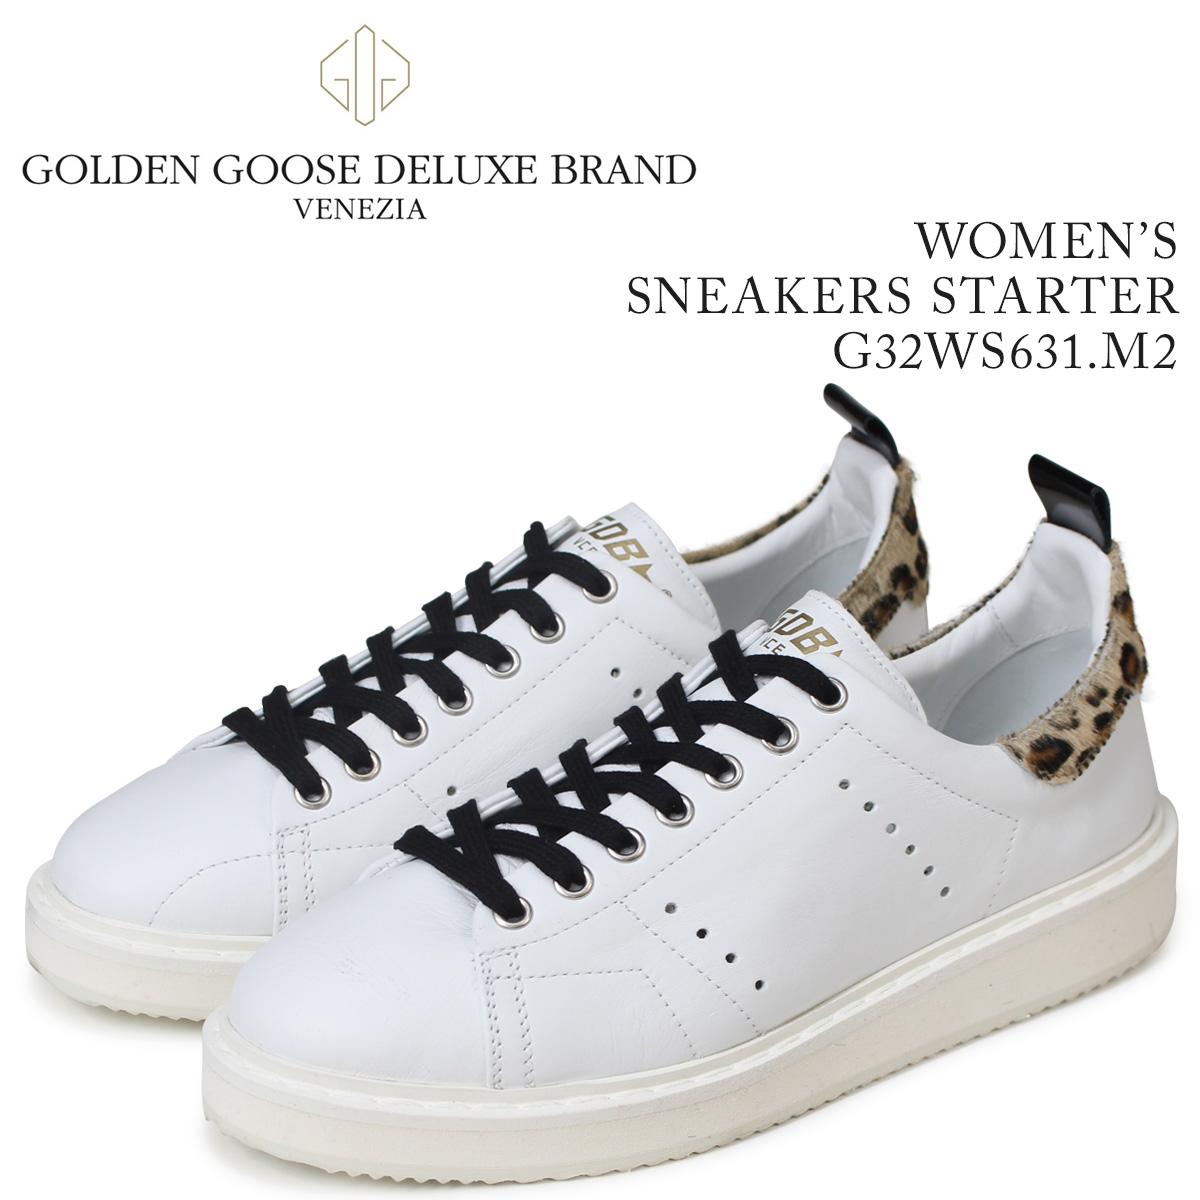 Golden Goose ゴールデングース スニーカー レディース スニーカーズ スターター SNEAKERS STARTER ホワイト 白 G32WS631 M2